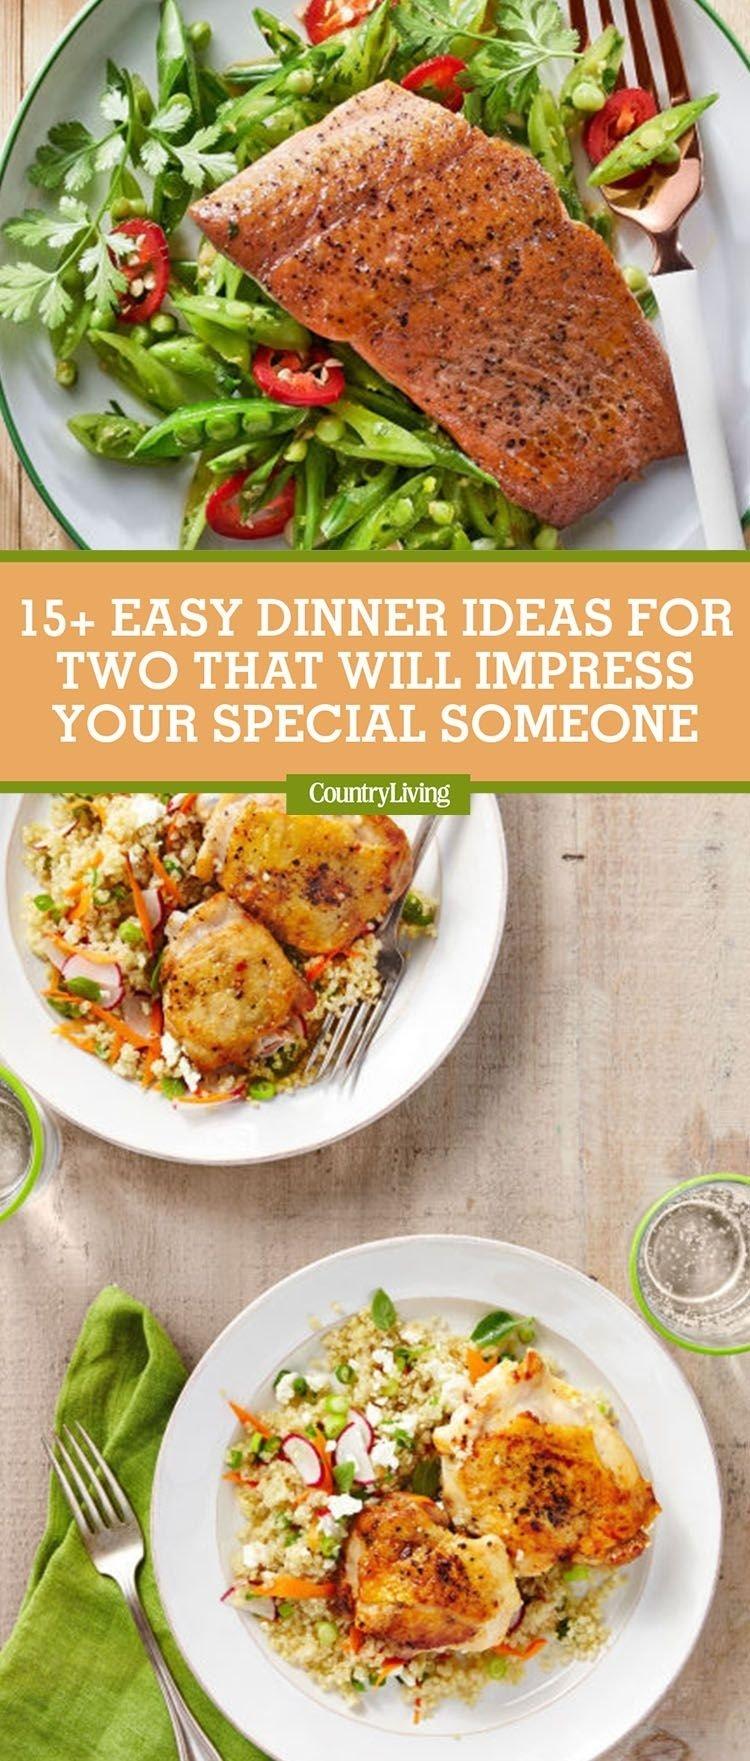 imágenes de cheap romantic dinner recipes for two